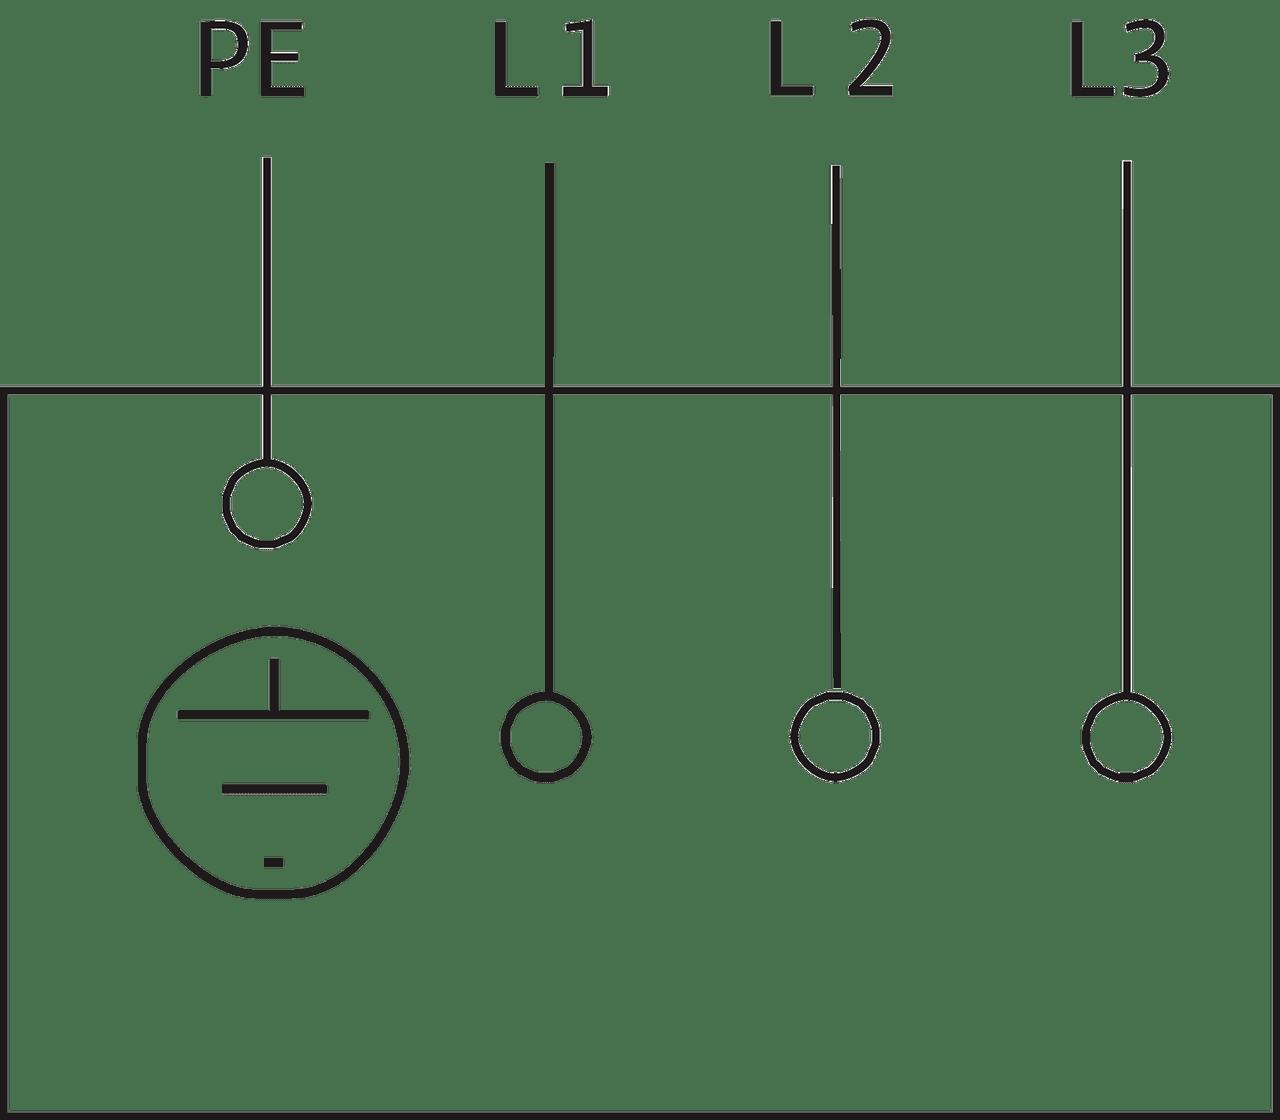 WRG-6251] 400 Volt Motor Wiring Diagram on